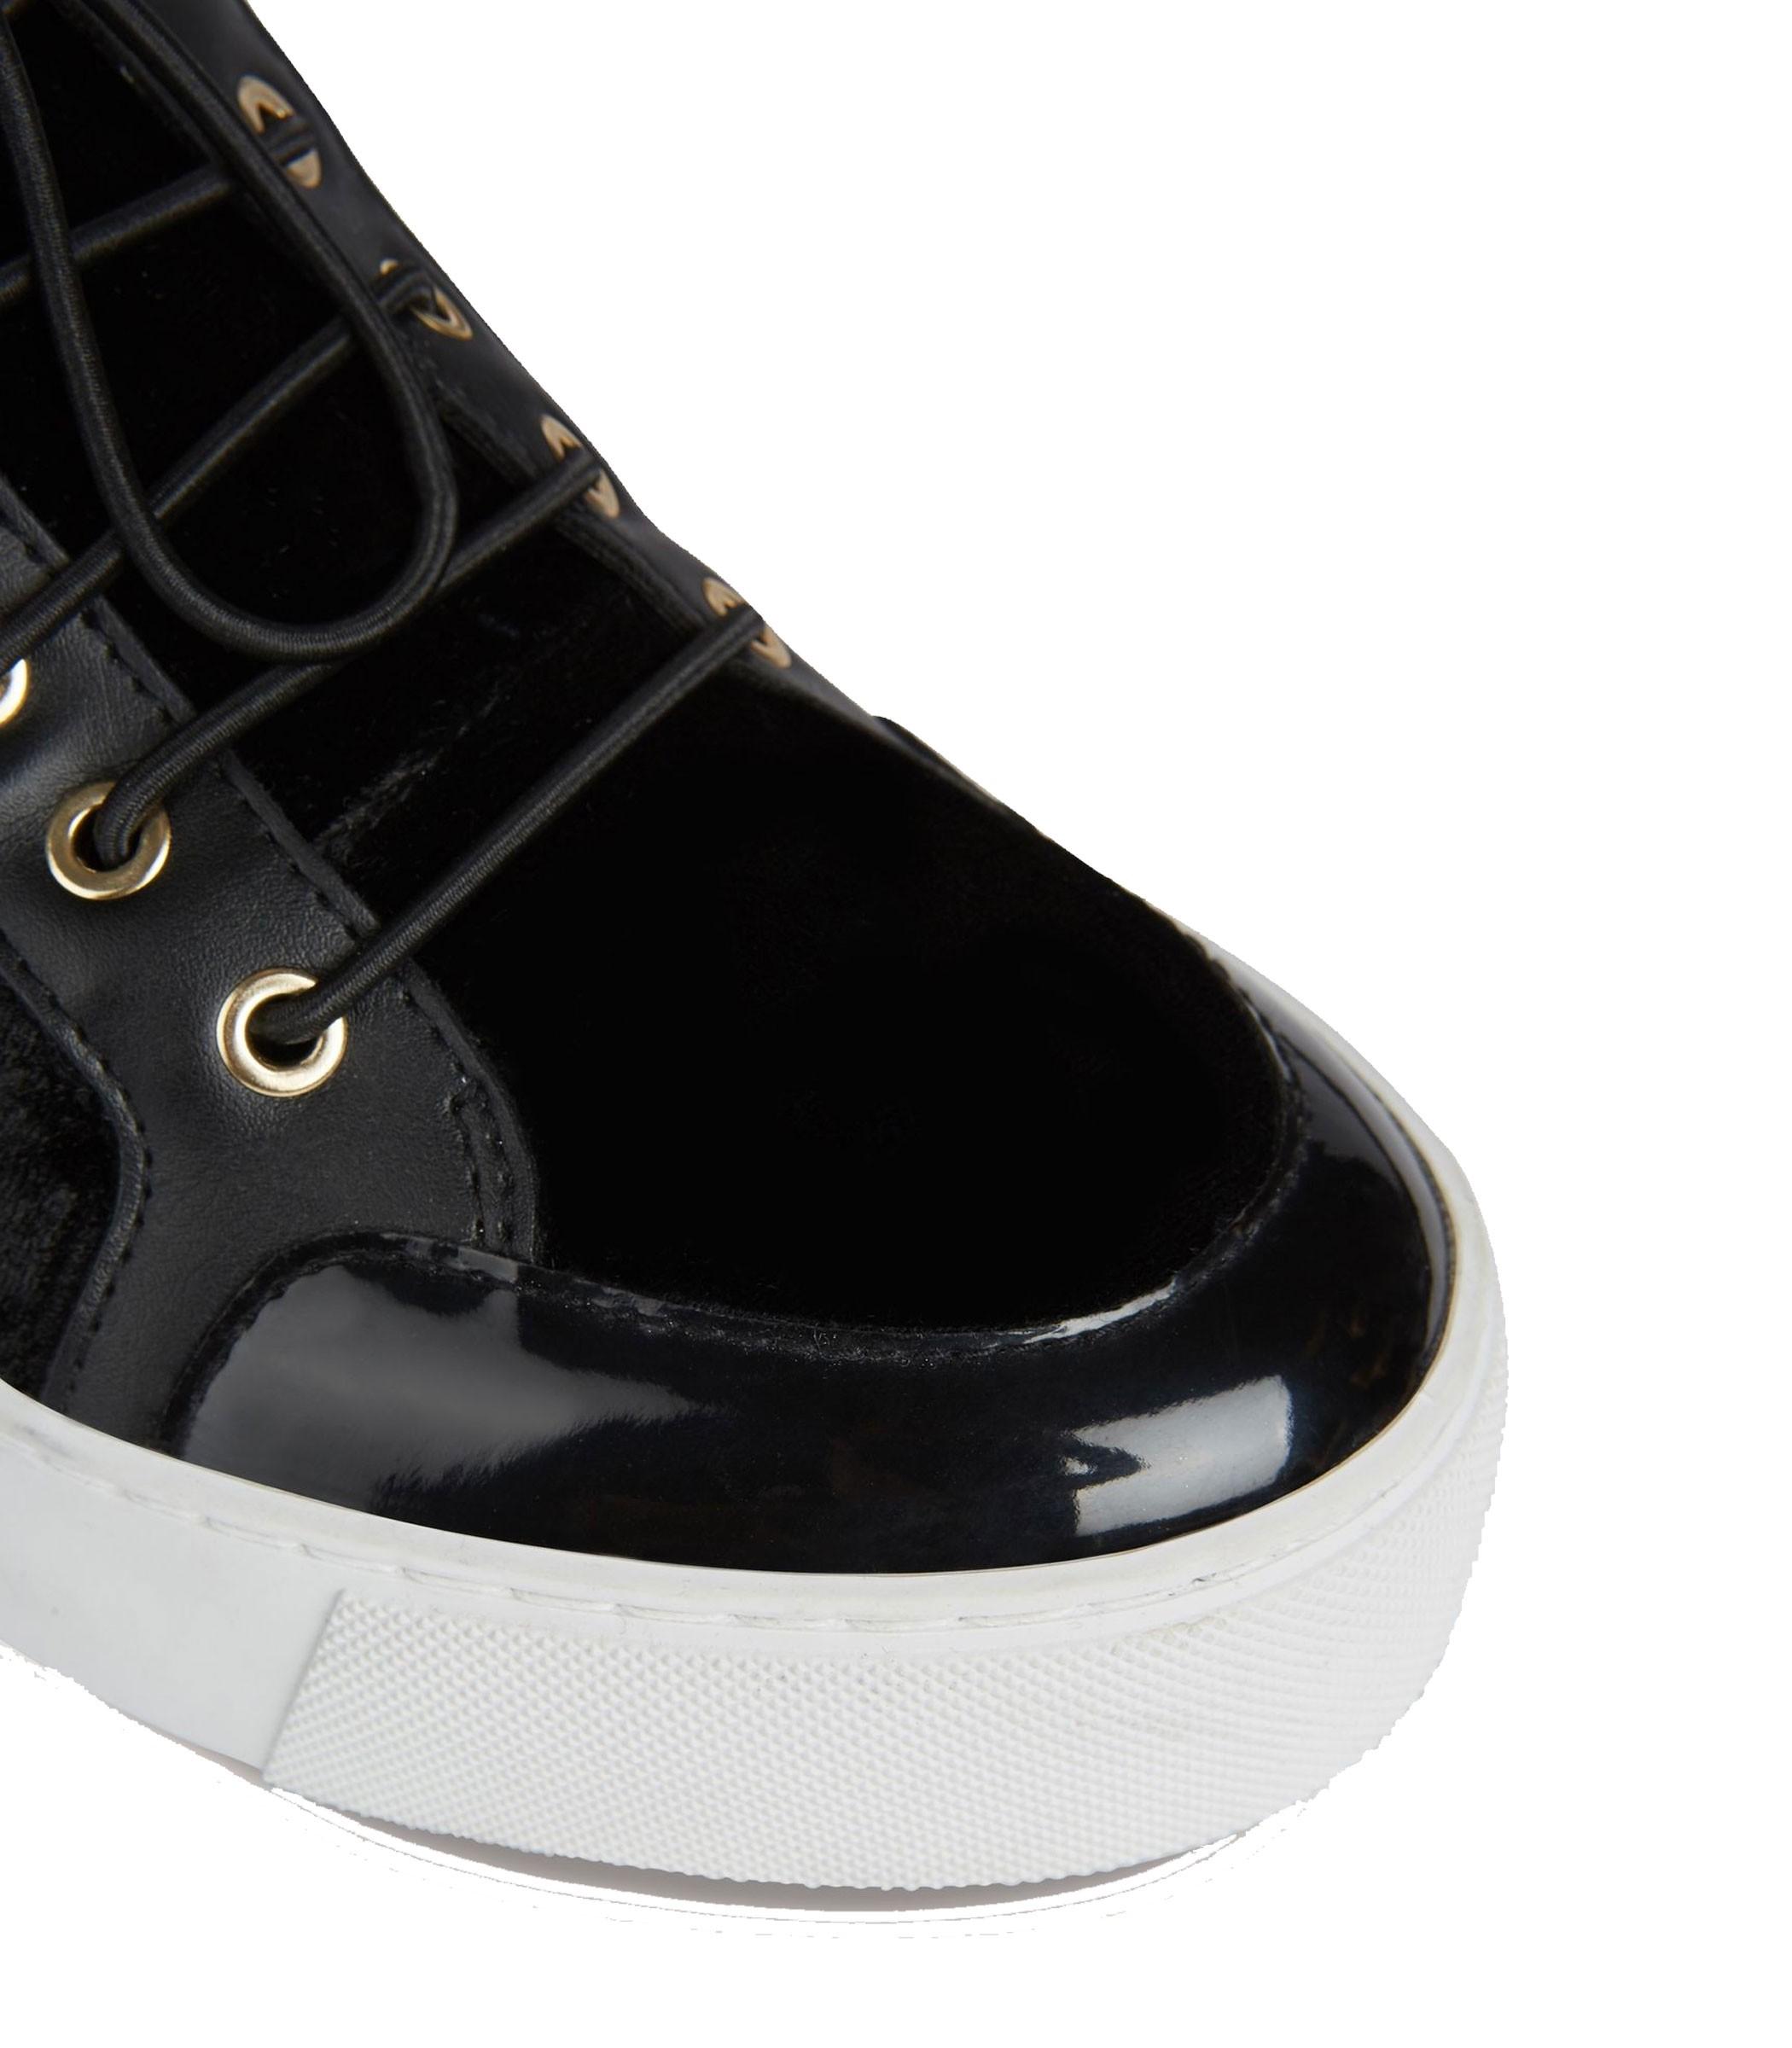 Armani Sneakers Da Donna Exchange Rif xdz002 Xv042 Scarpe FKJlTc1